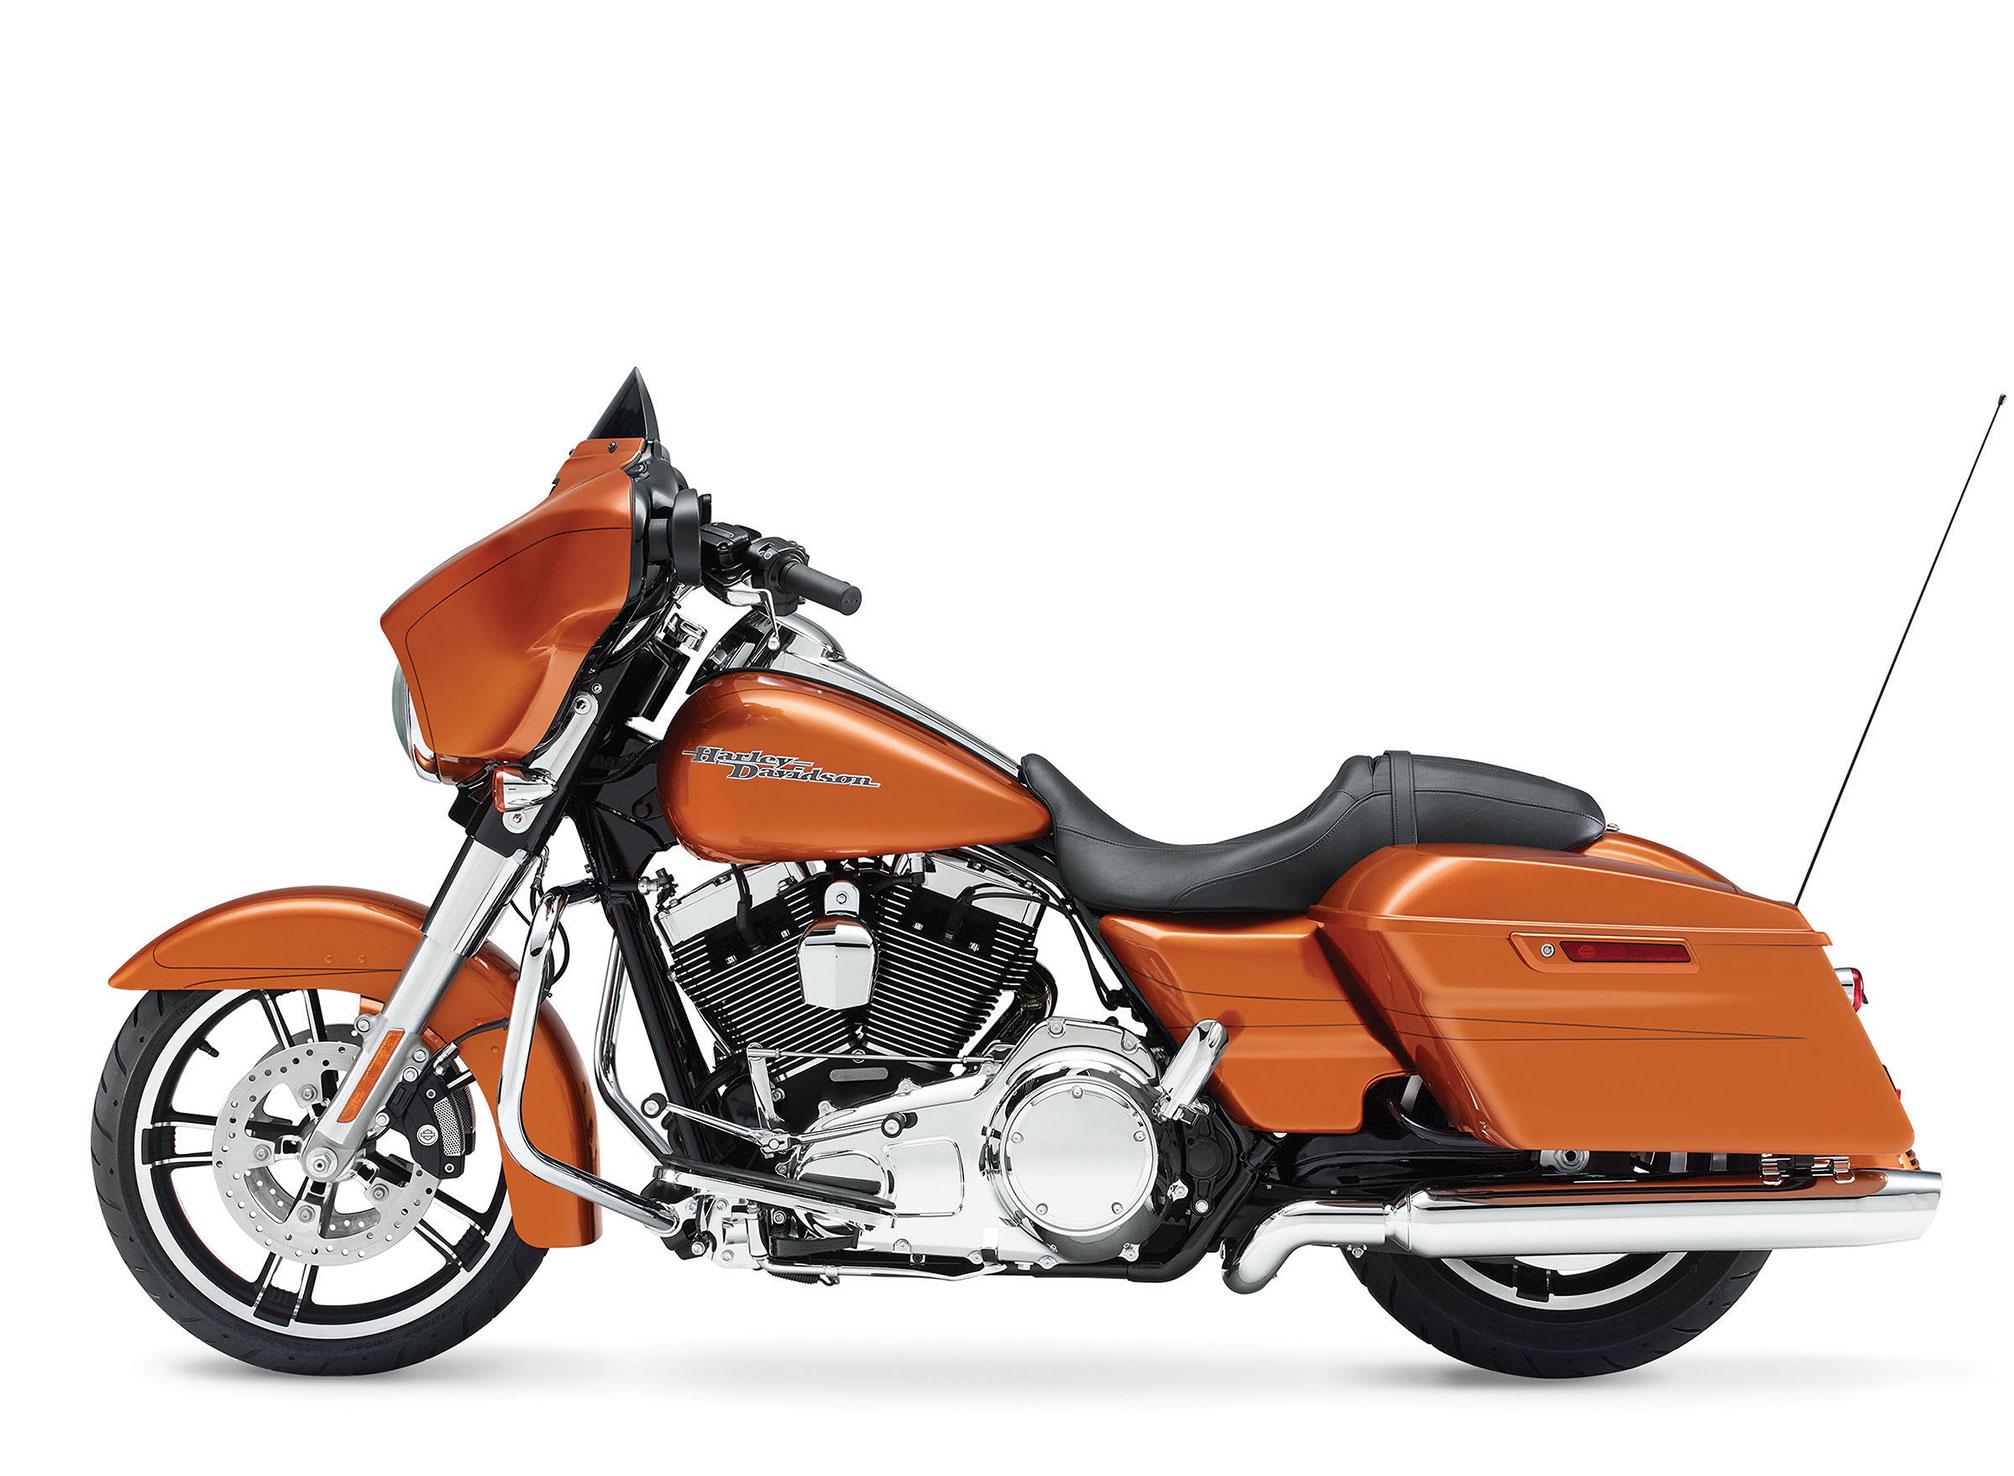 2014 Harley Davidson FLHXS Street Glide Special G